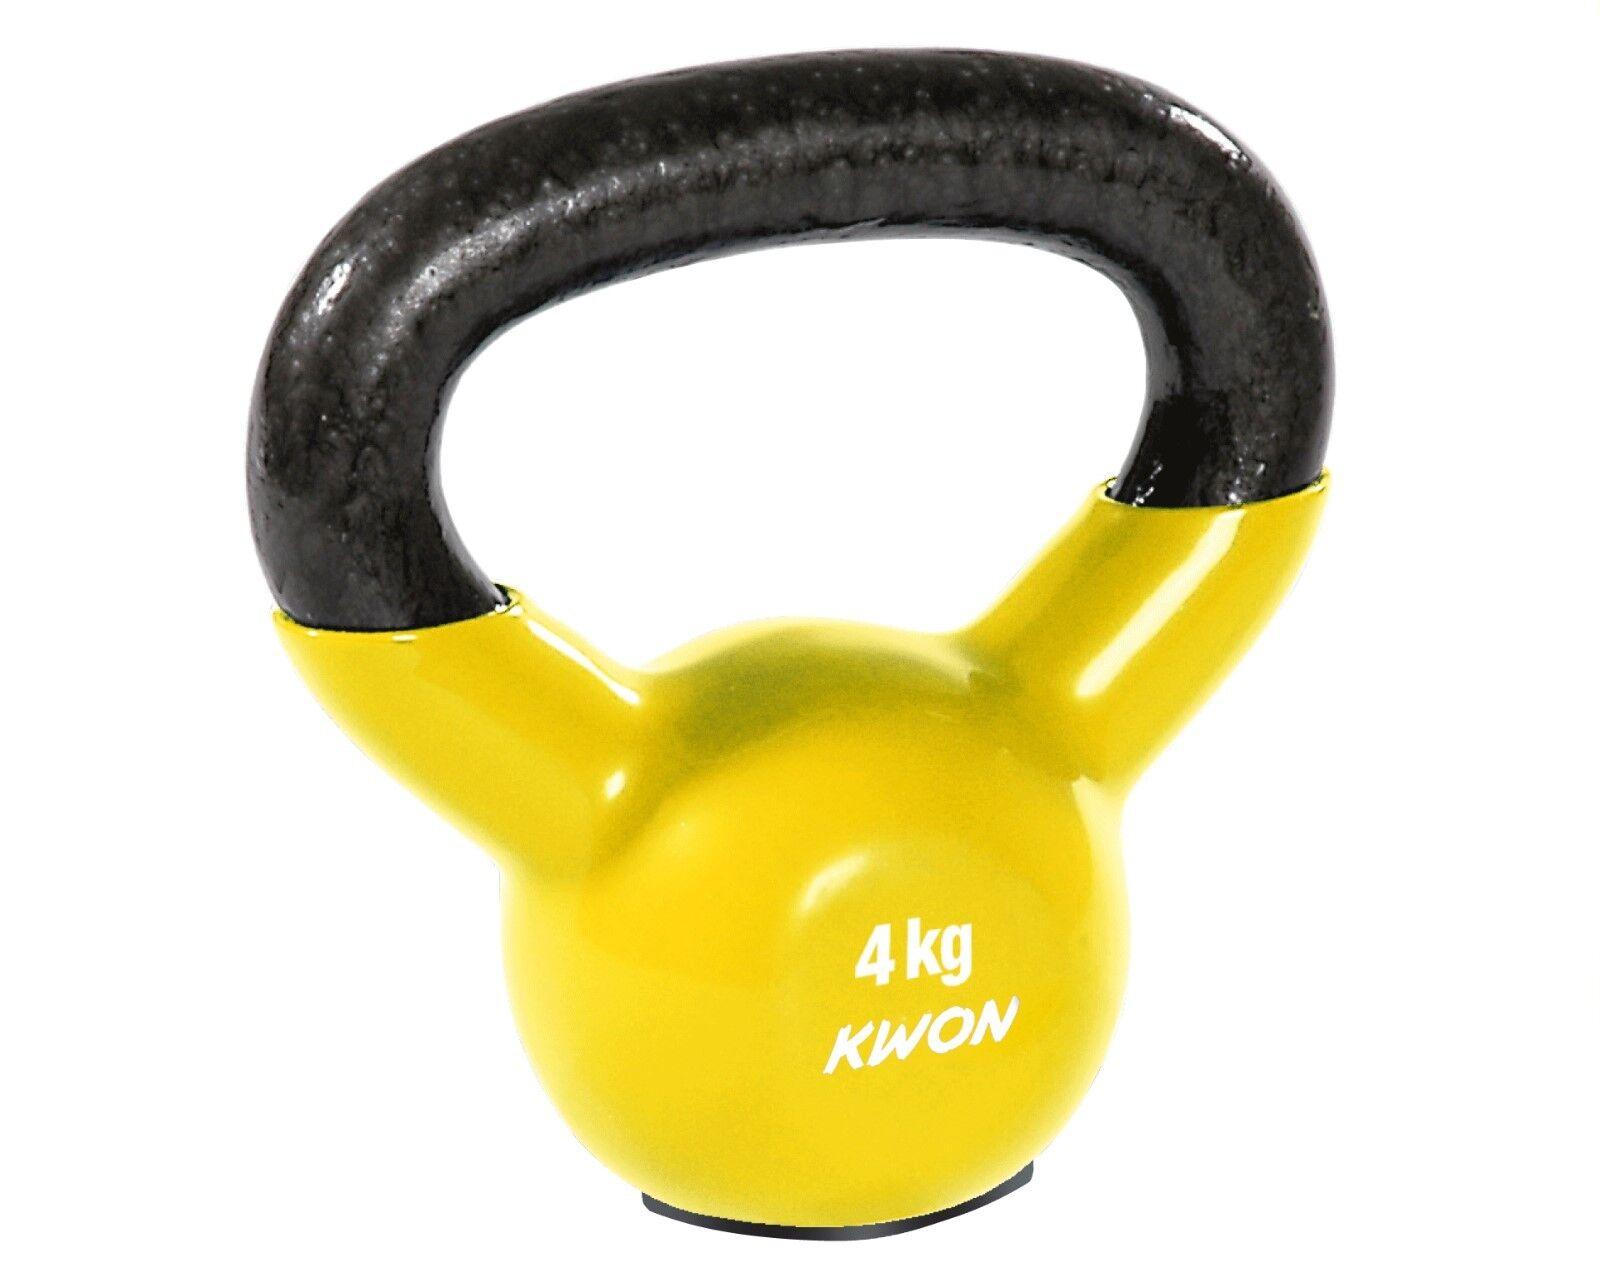 PallaKettlebell per kraftraining, 4  16 KG. Fitness, Palla,